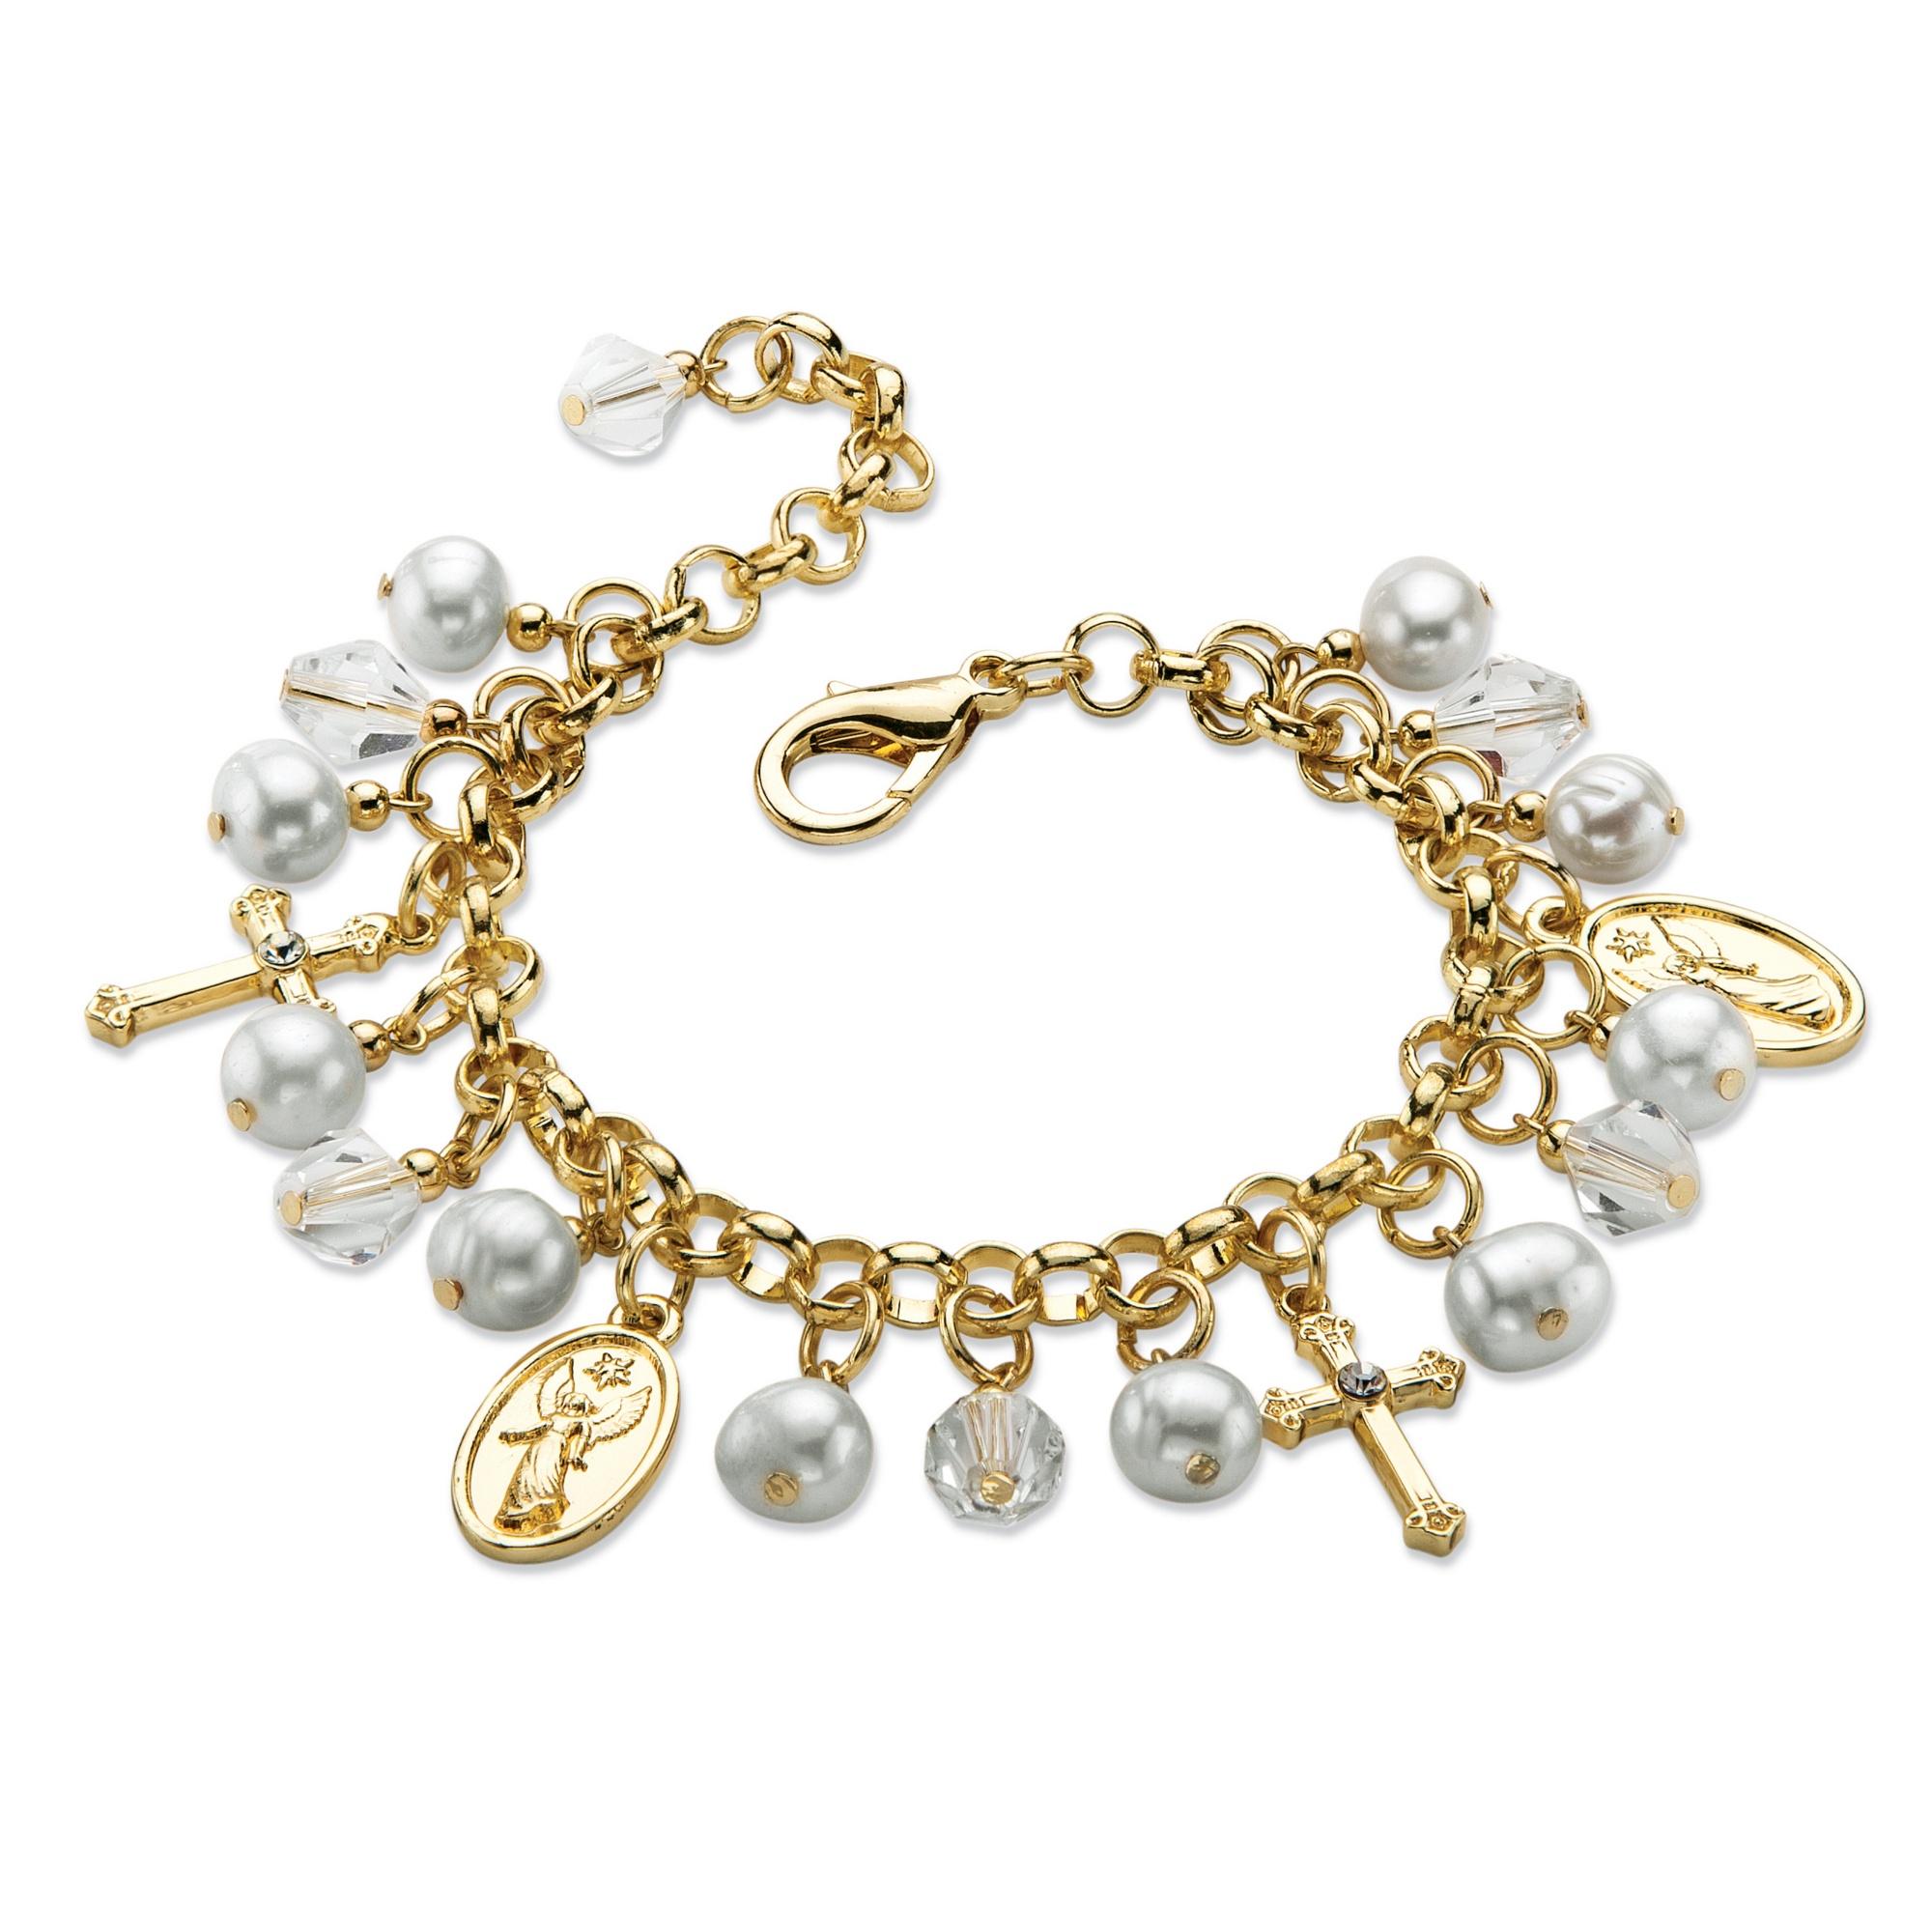 Religious Charm Bracelets: Round Simulated Pearl And Crystal Religious Charm Bracelet